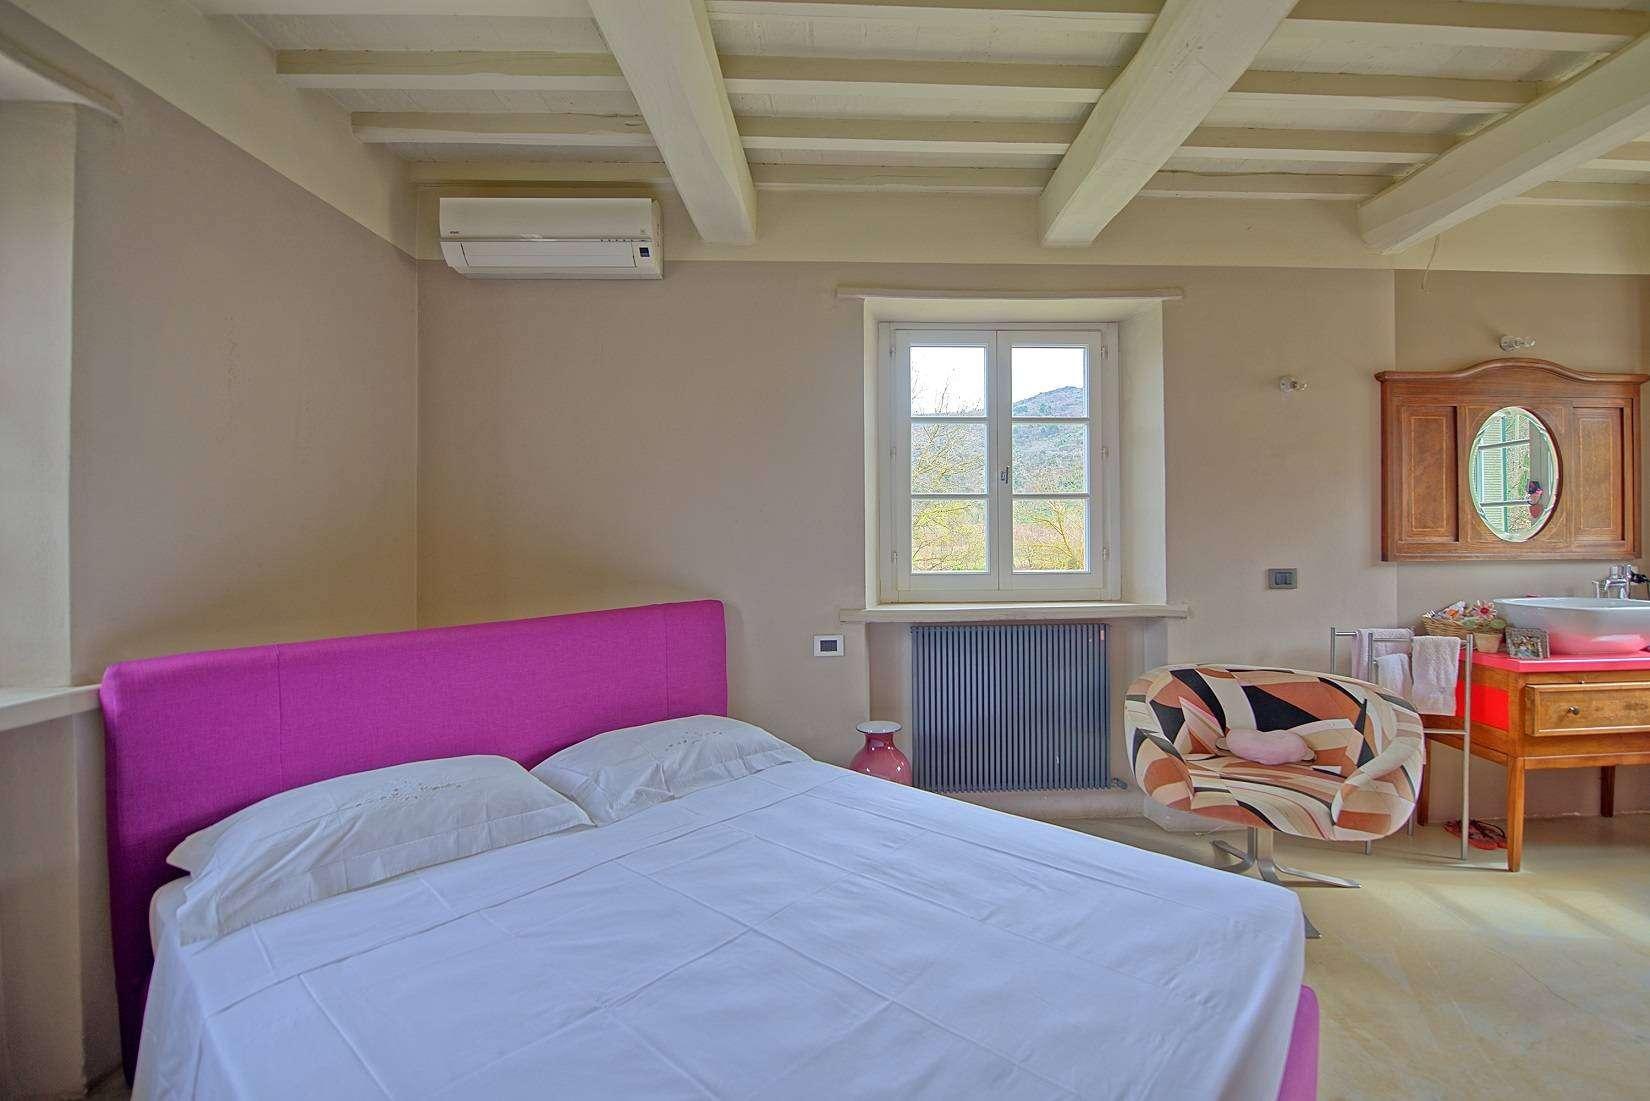 23 Jacopo Double bedroom